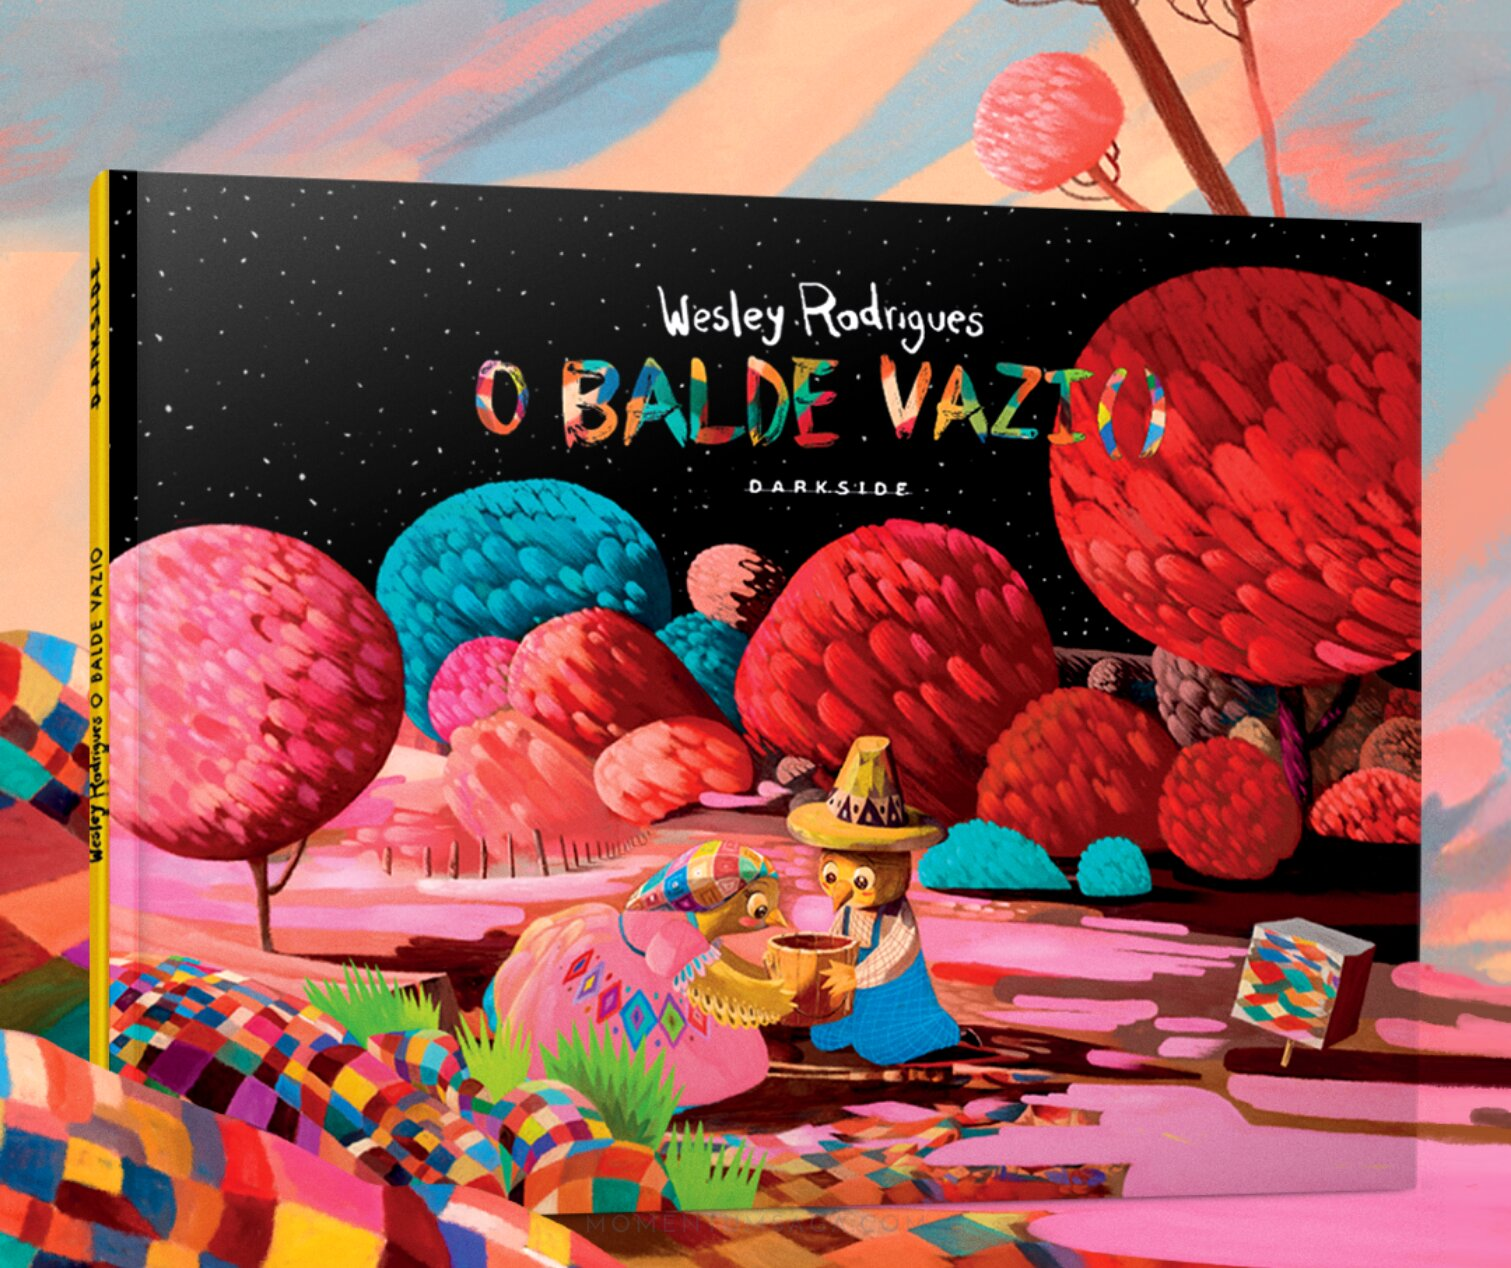 Resenha: O Balde Vazio, de Wesley Rodrigues